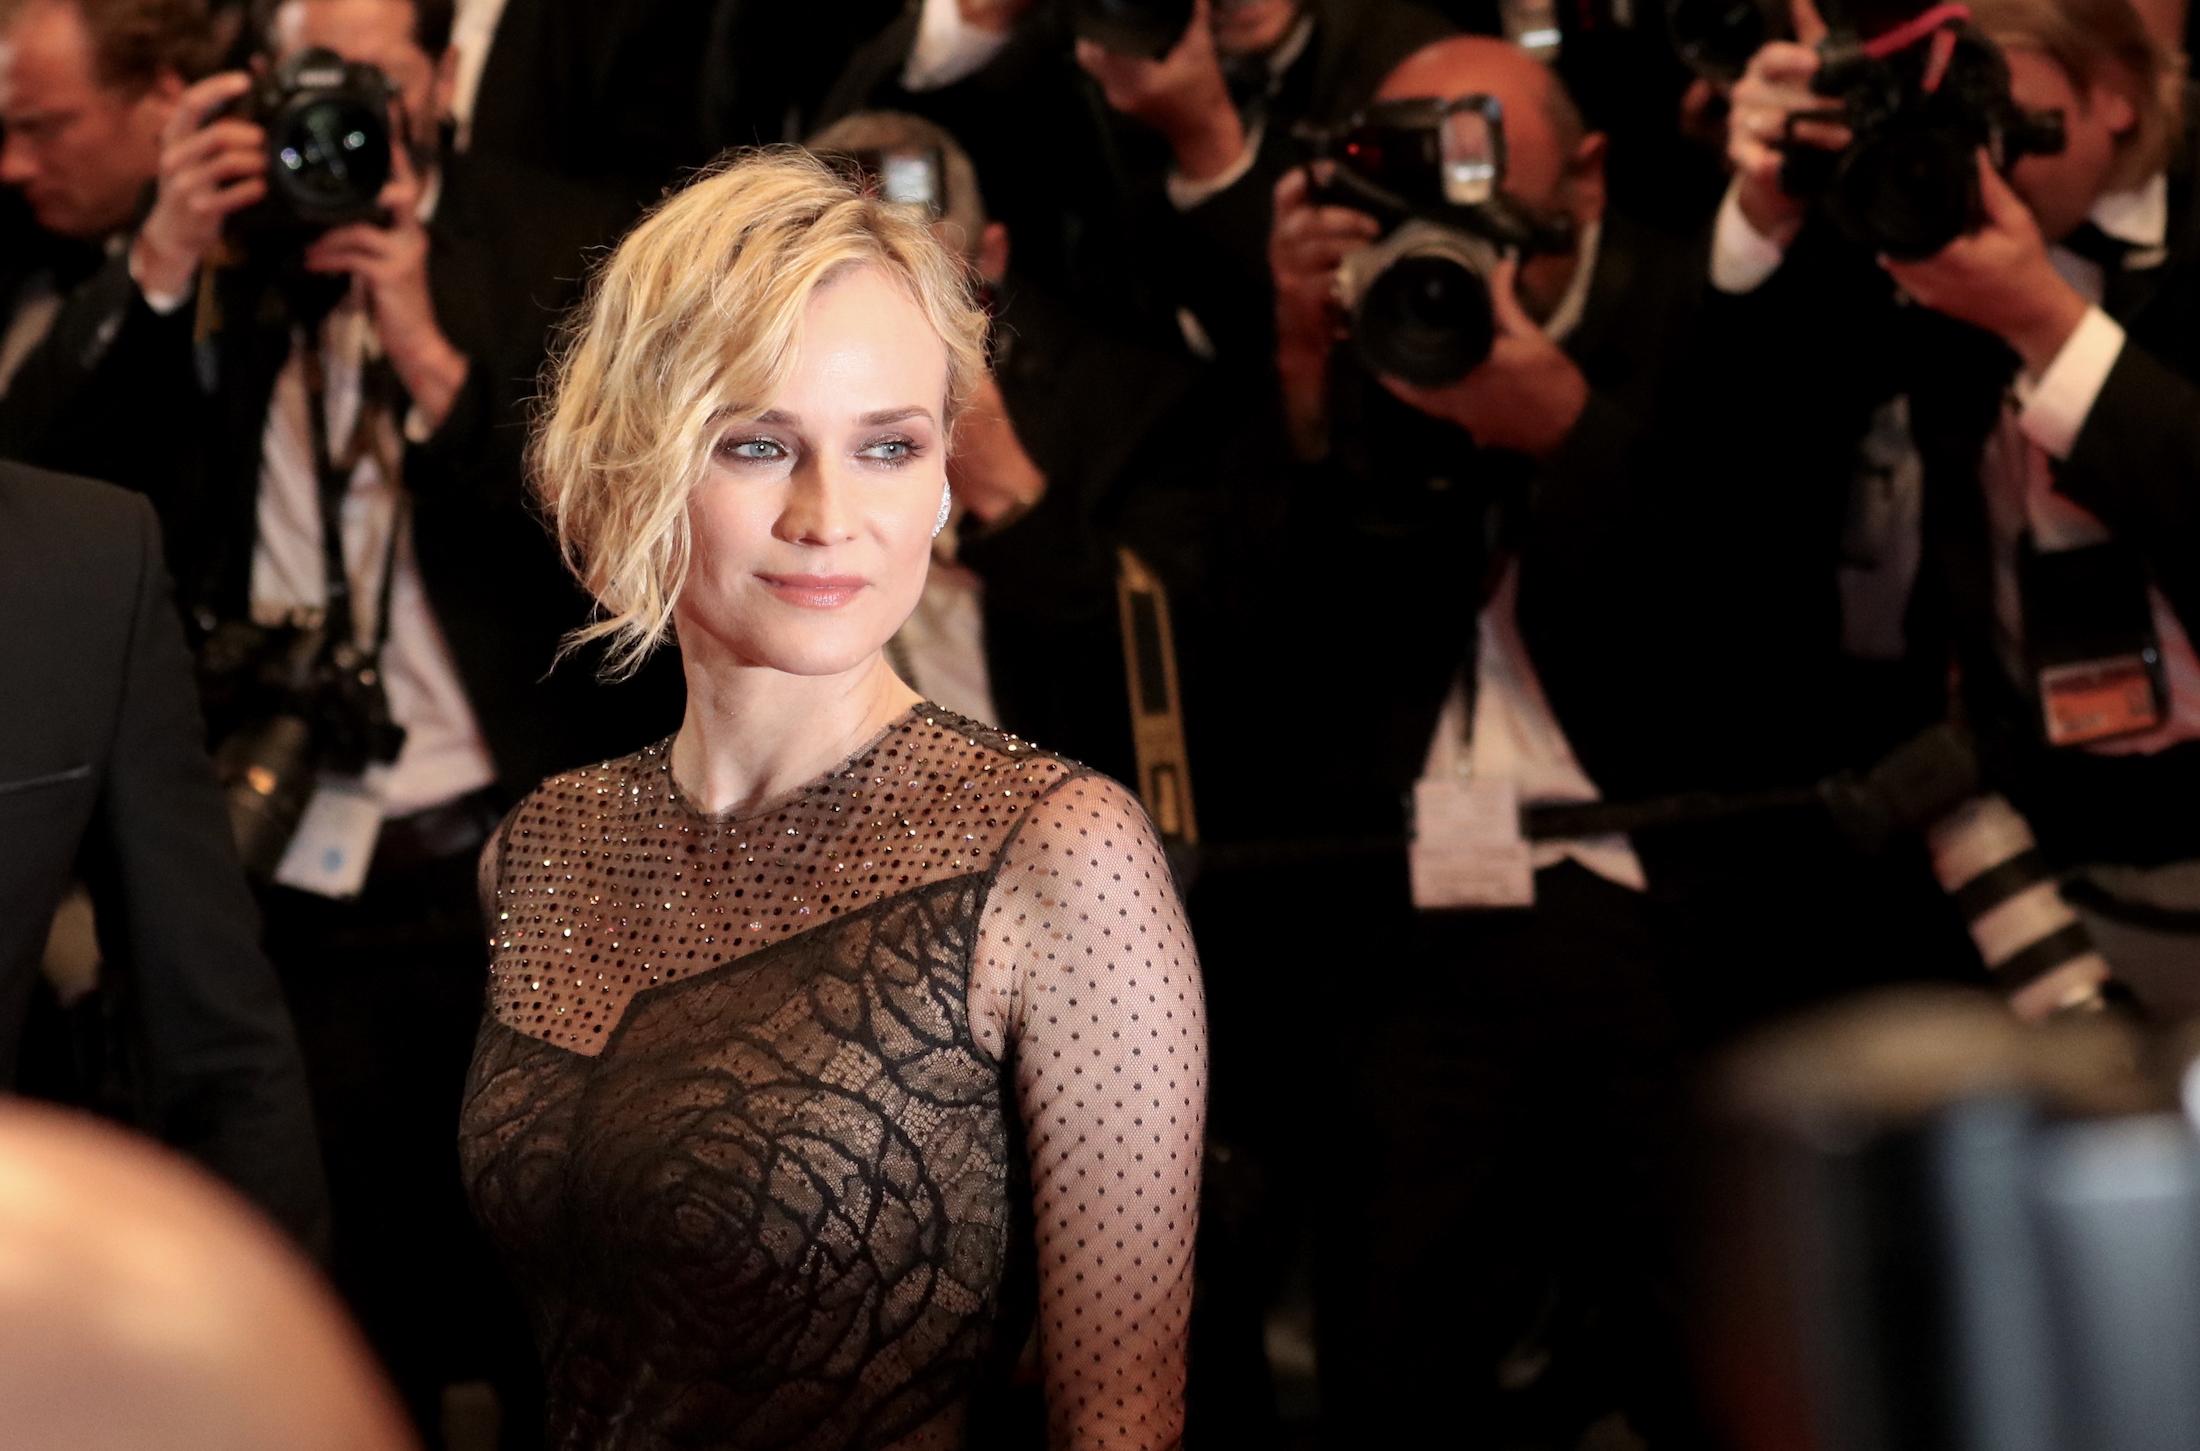 Cannes 2017: la bellissima Diane Kruger sul red carpet di In the Fade